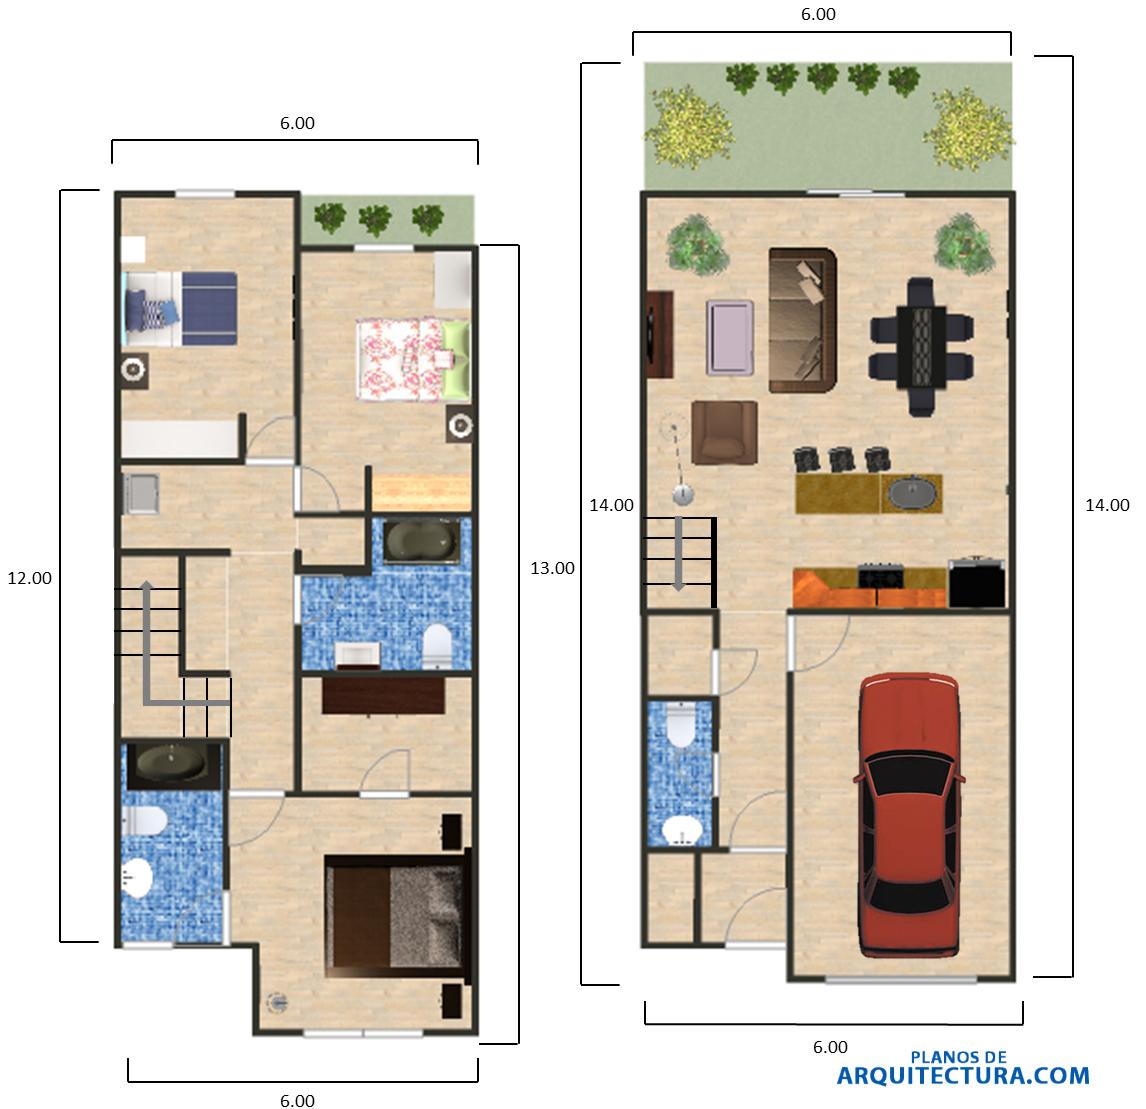 Dise o de casa peque a 84 m planos de arquitectura for Planos de casas de dos dormitorios